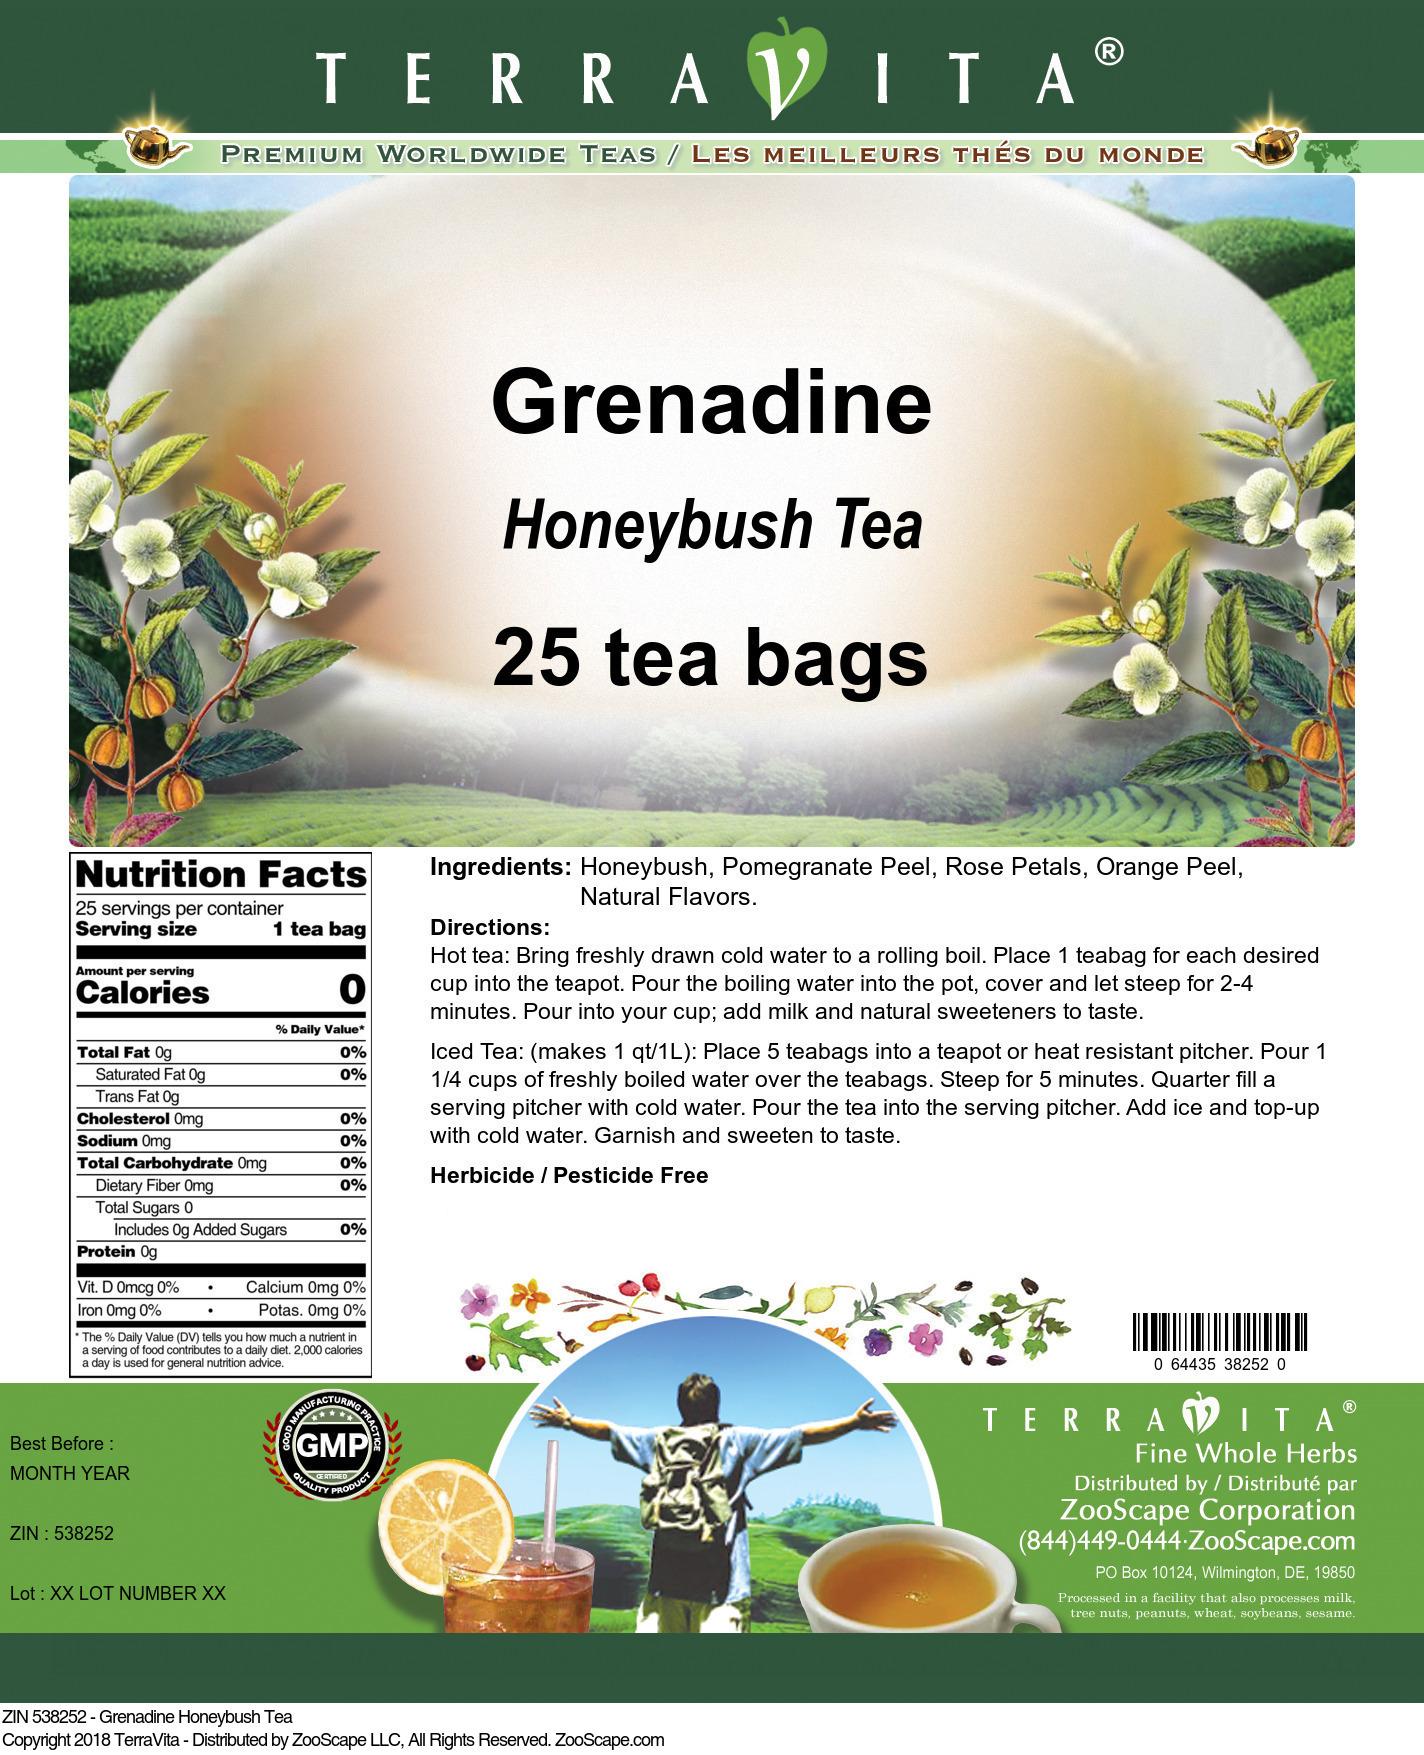 Grenadine Honeybush Tea